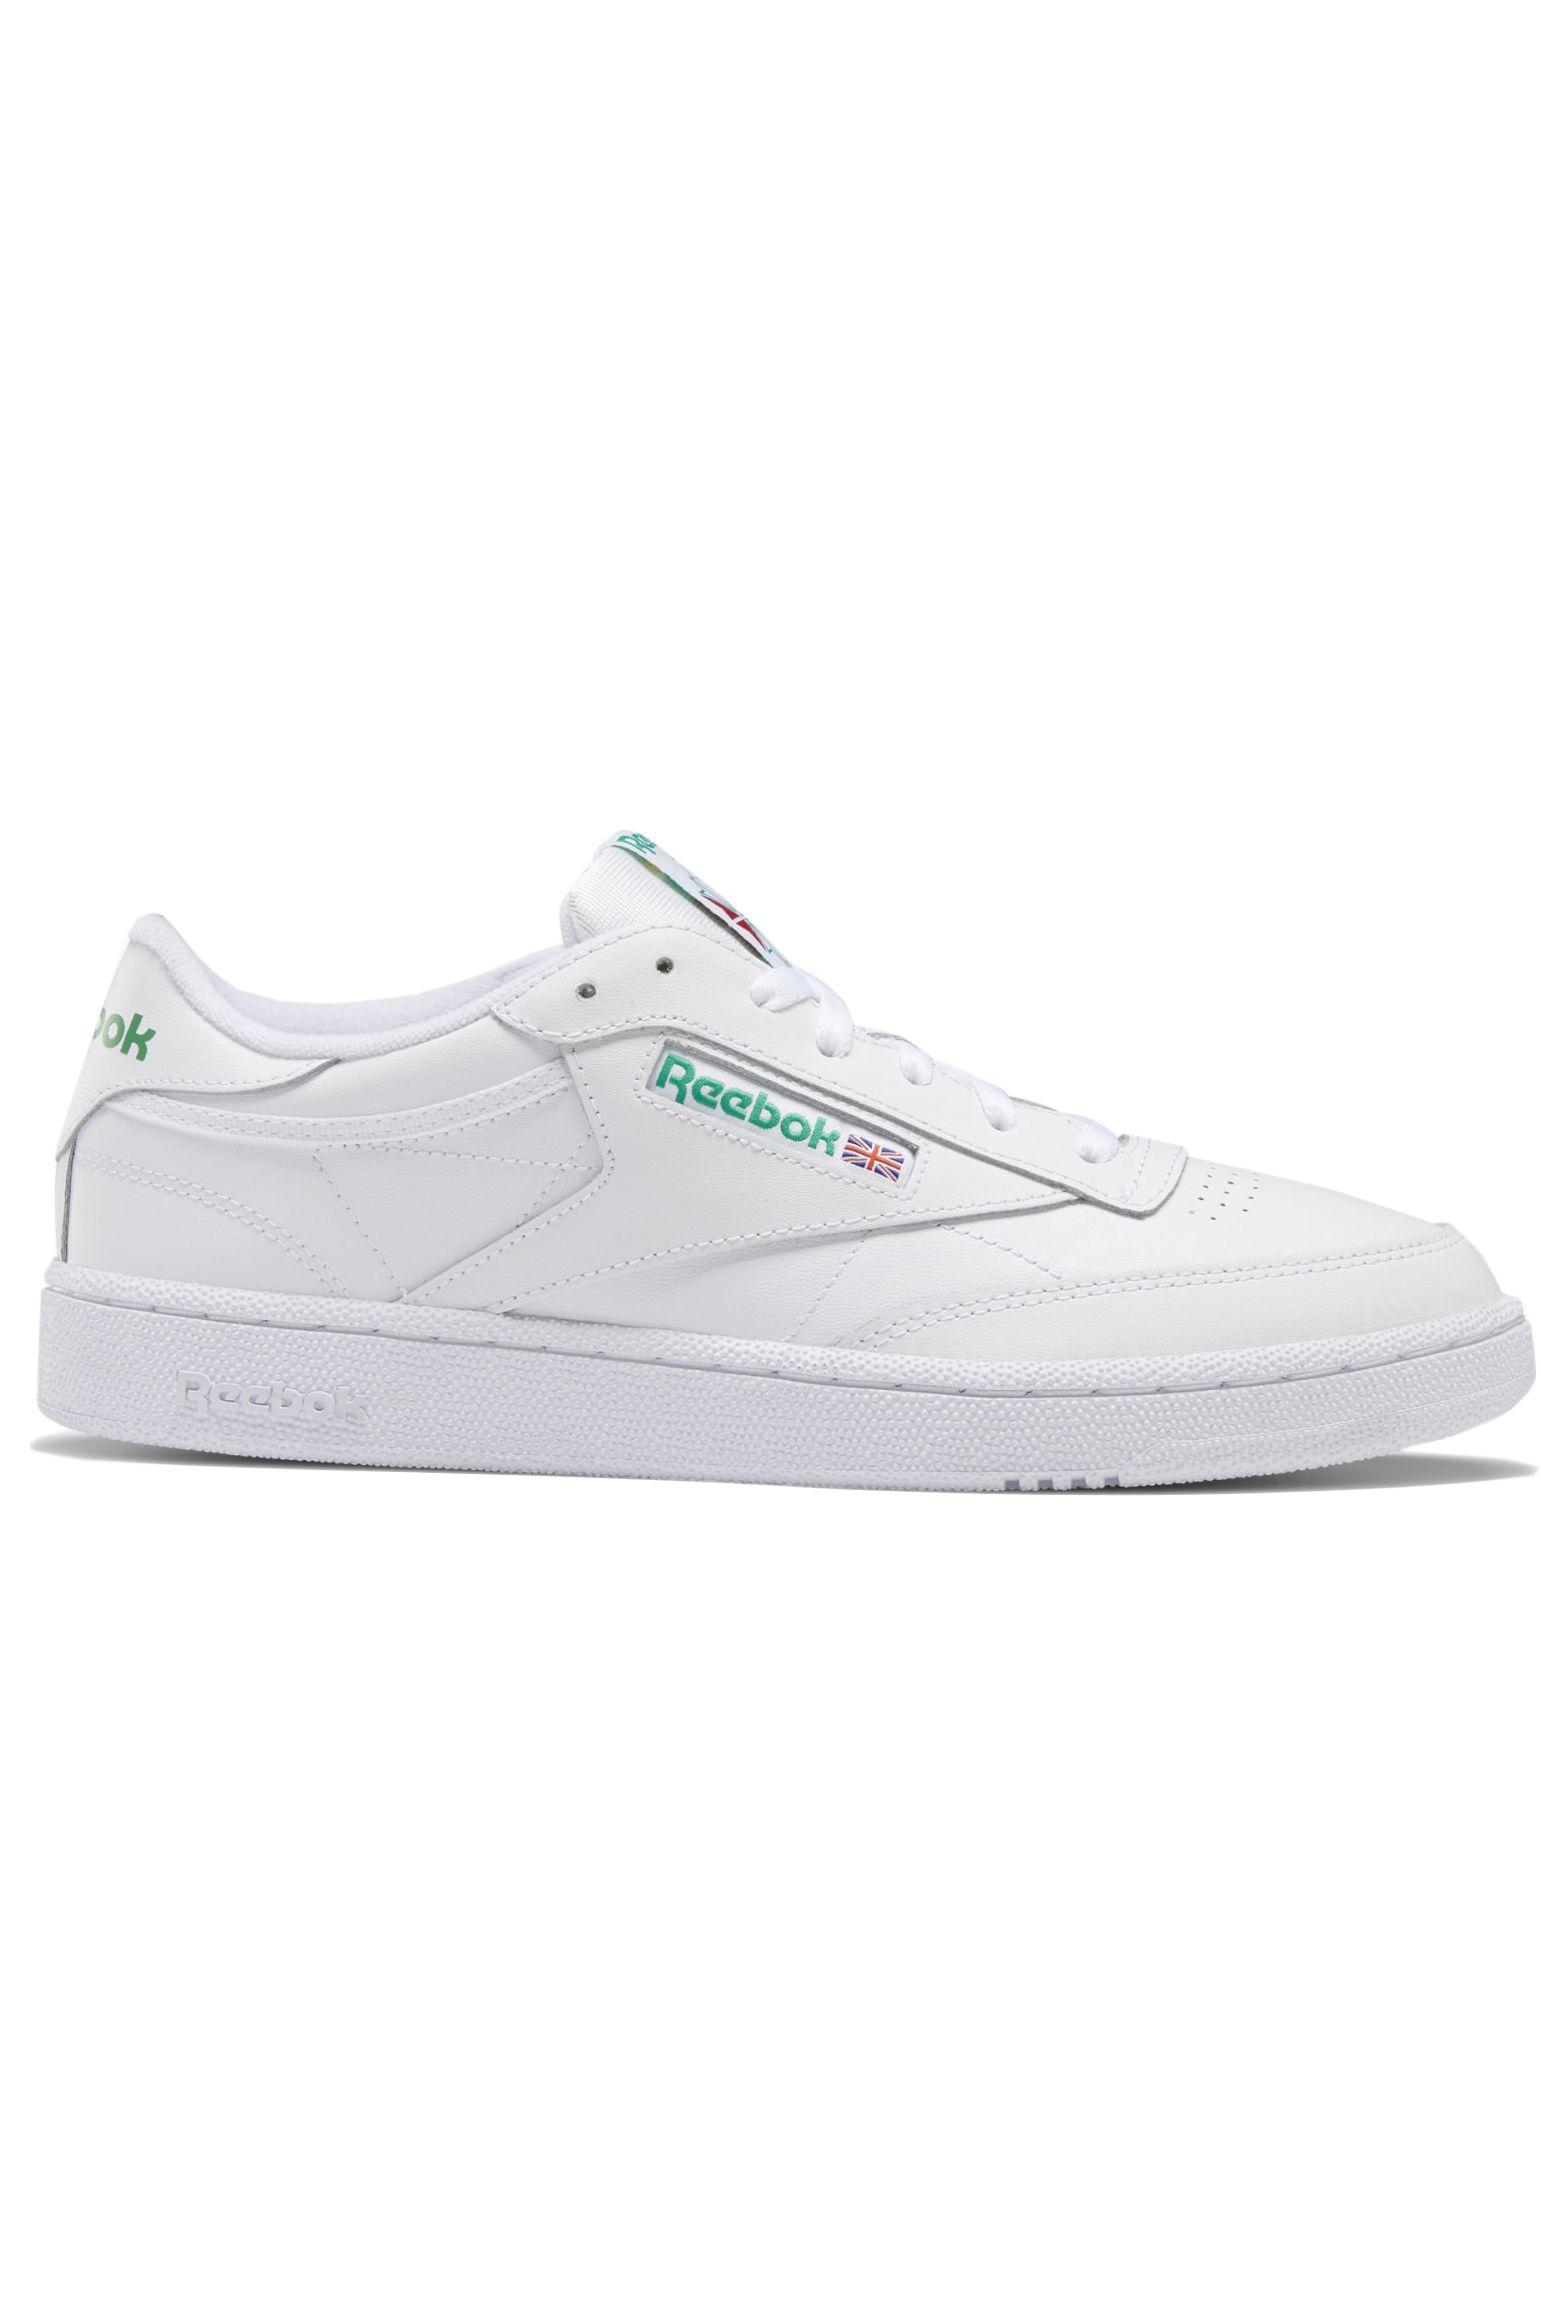 Tenis Reebok CLUB C 85 Int-White/Green